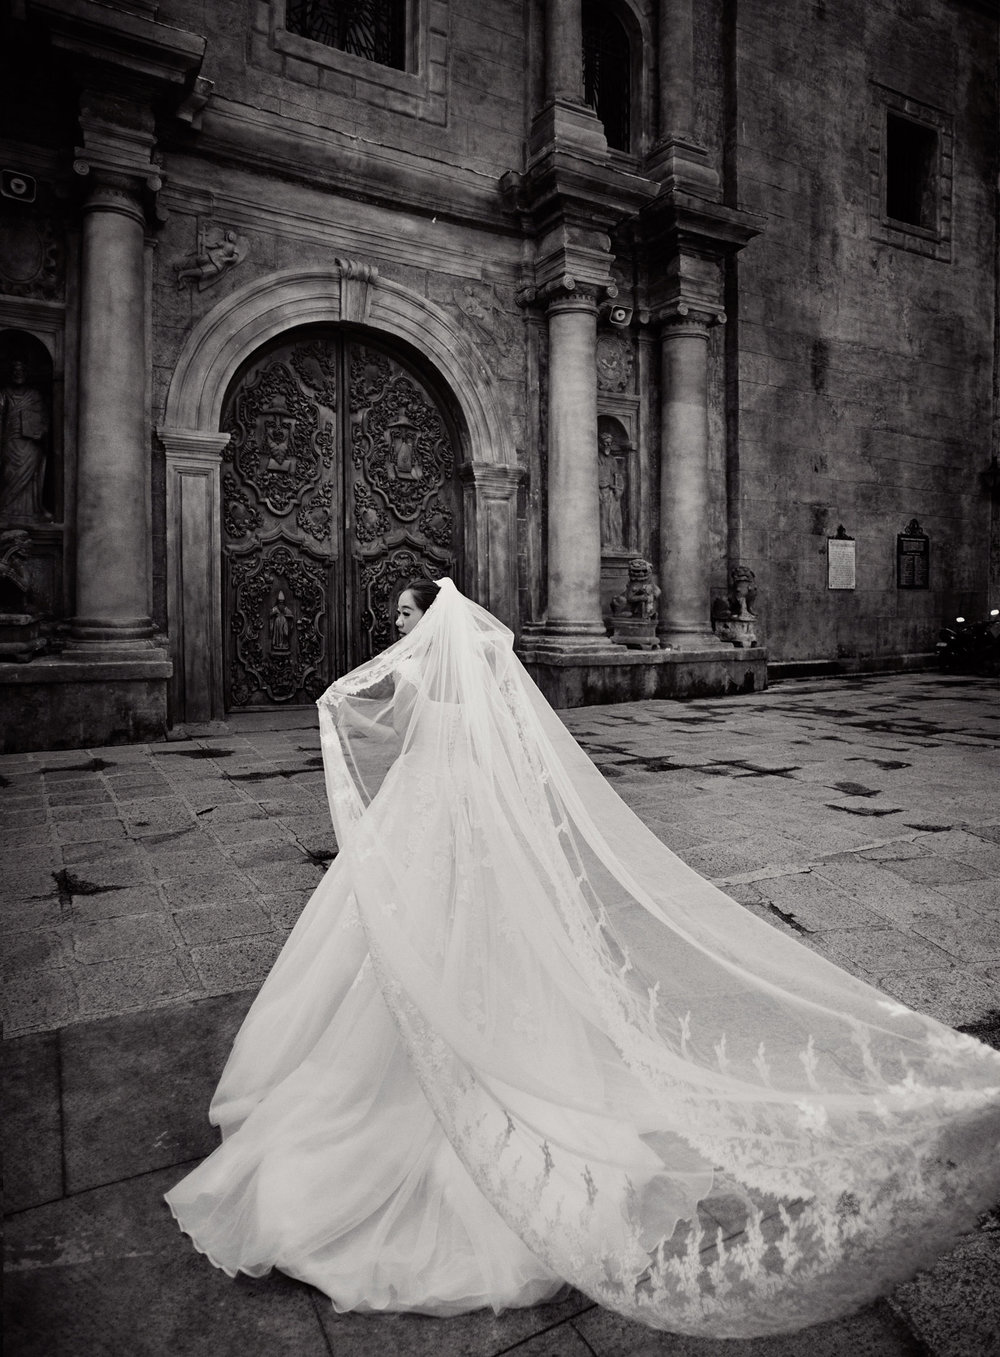 Chris_Hui_婚禮_婚紗照_pre_wedding_photography_best_052_.jpg